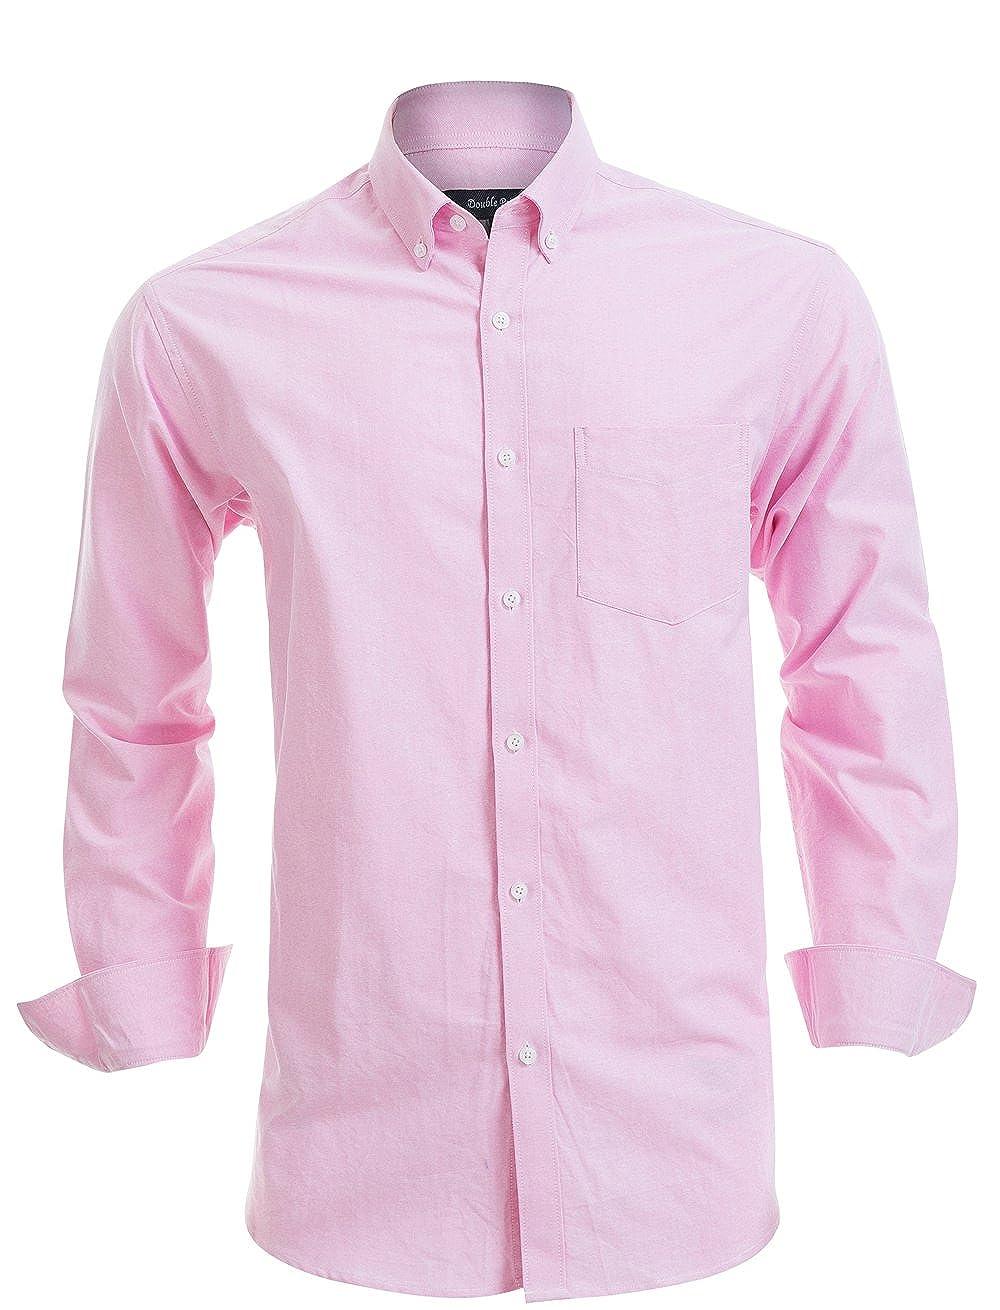 04ec155a040 Double Pump Mens Button Down Shirts 100% Cotton Long Sleeve Shirts Regular  Fit